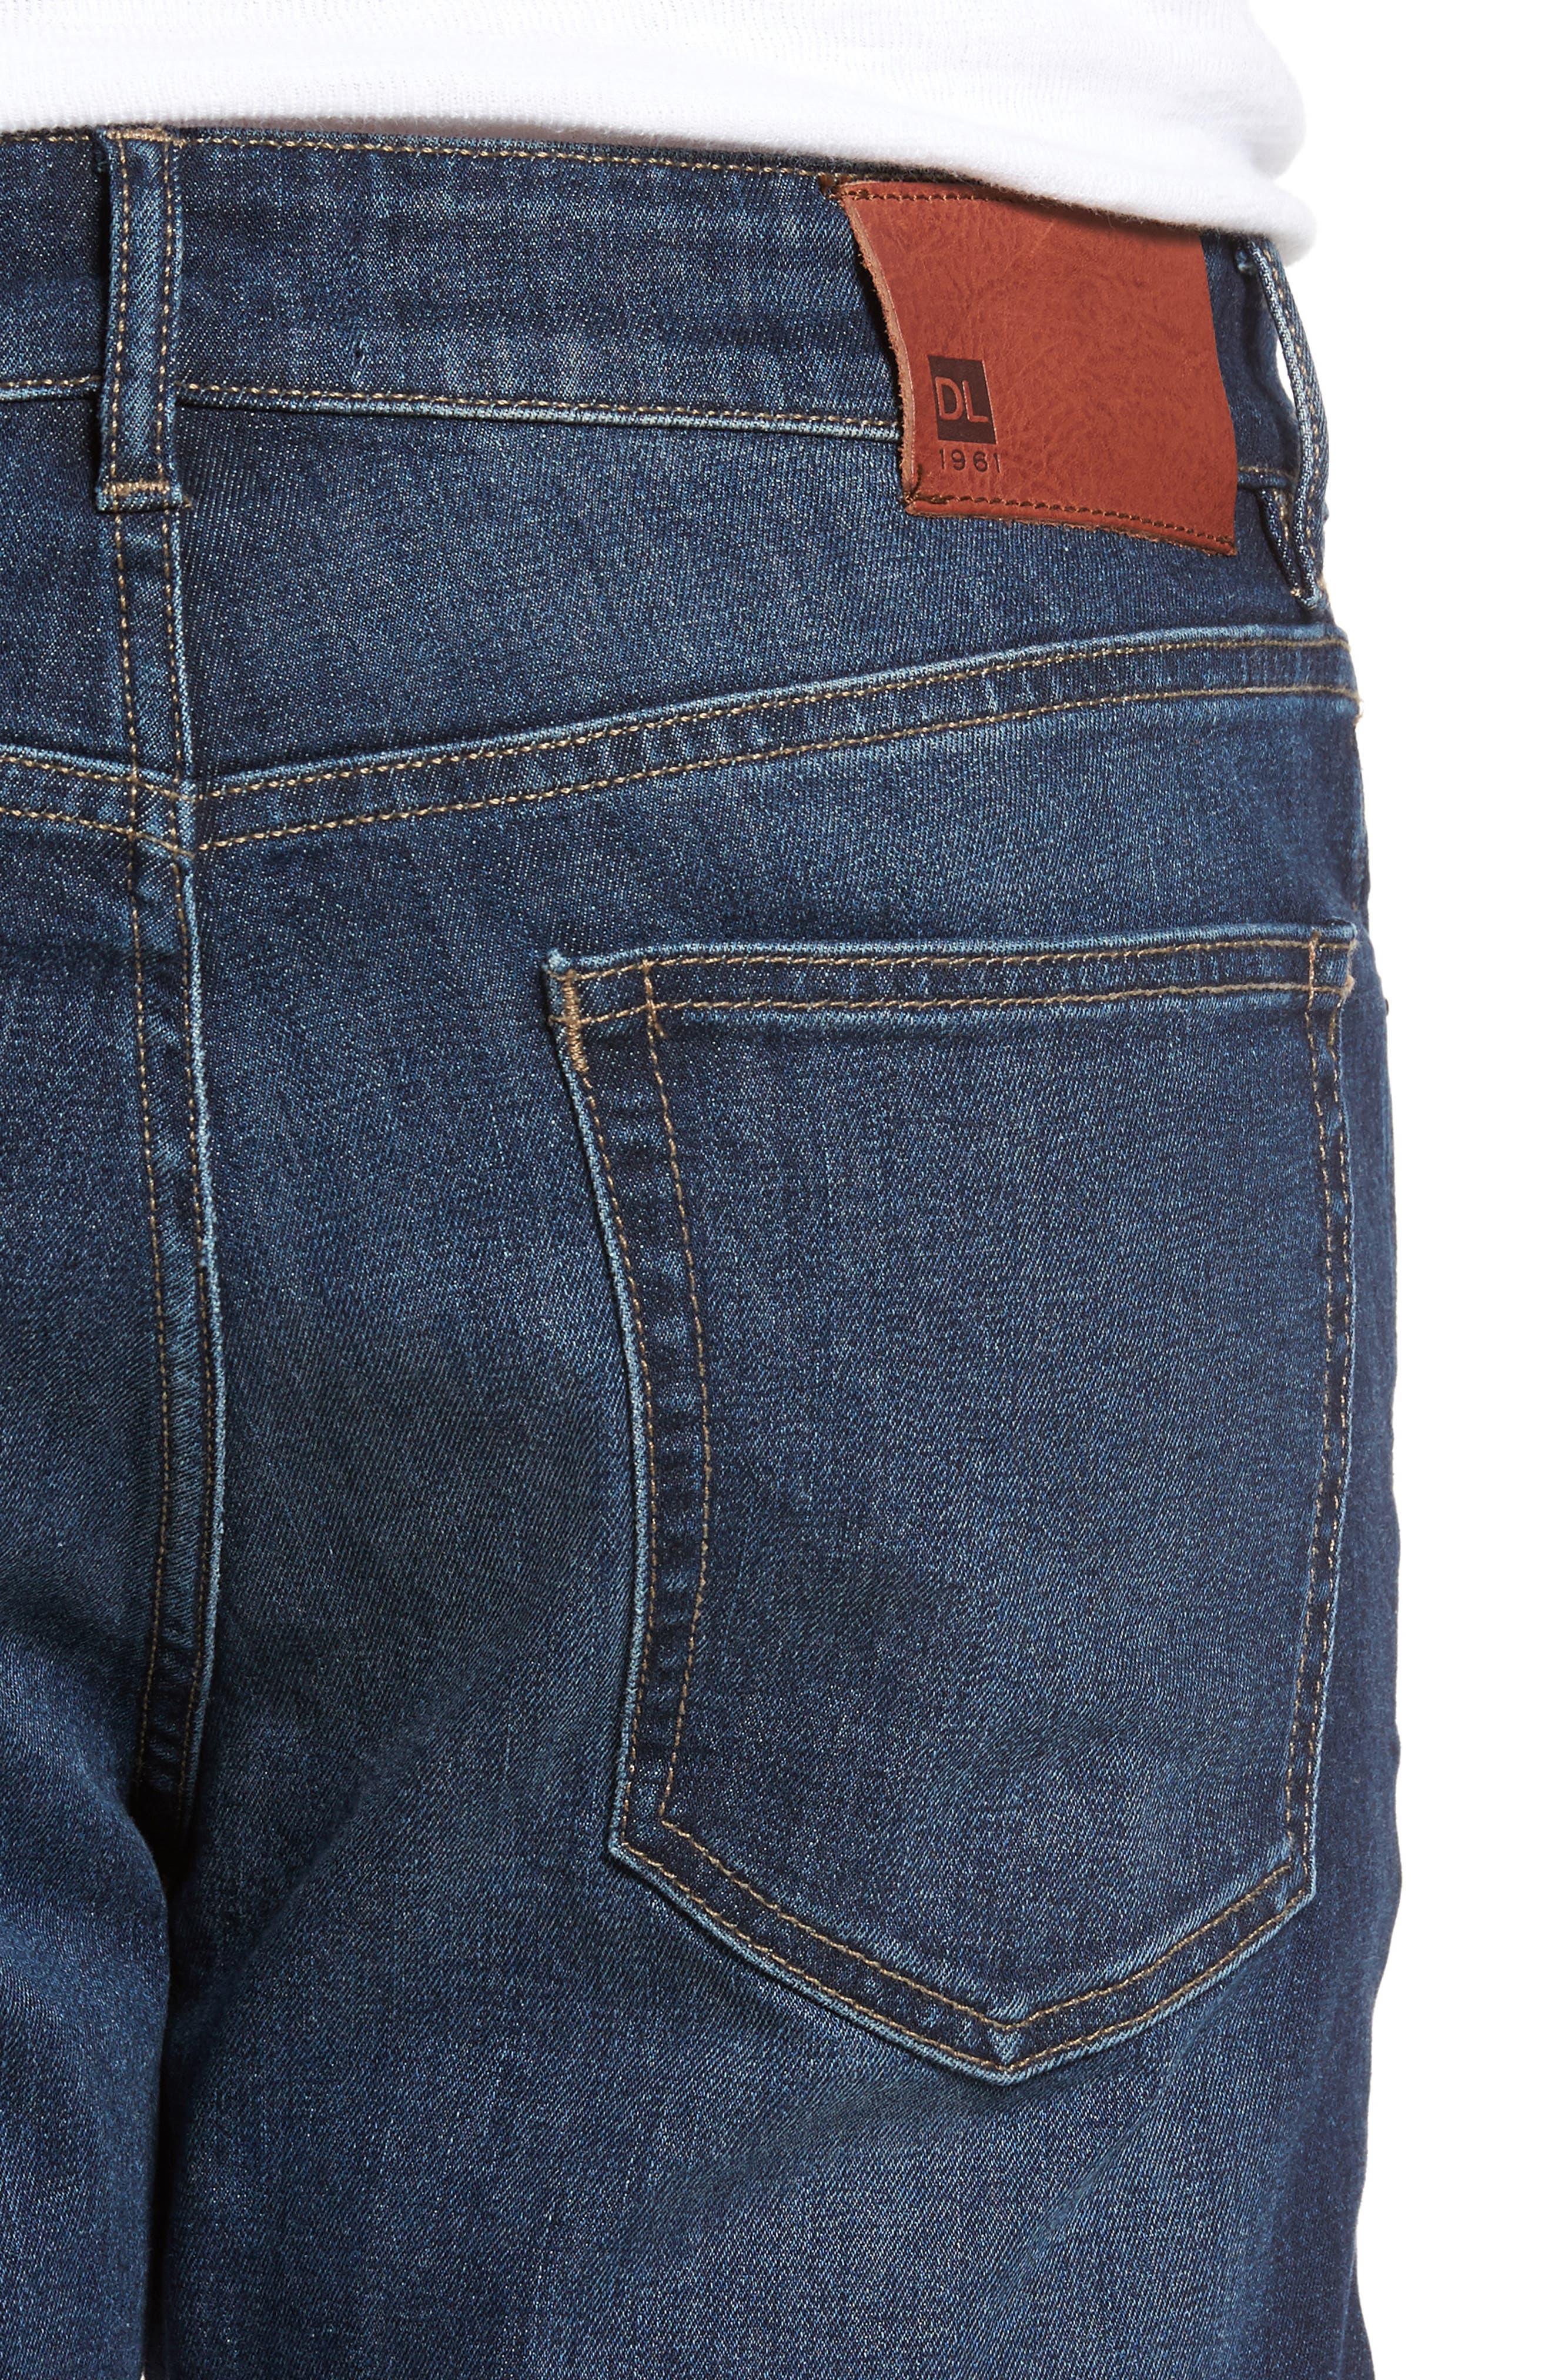 Alternate Image 4  - DL1961 Russell Slim Straight Leg Jeans (Marine)